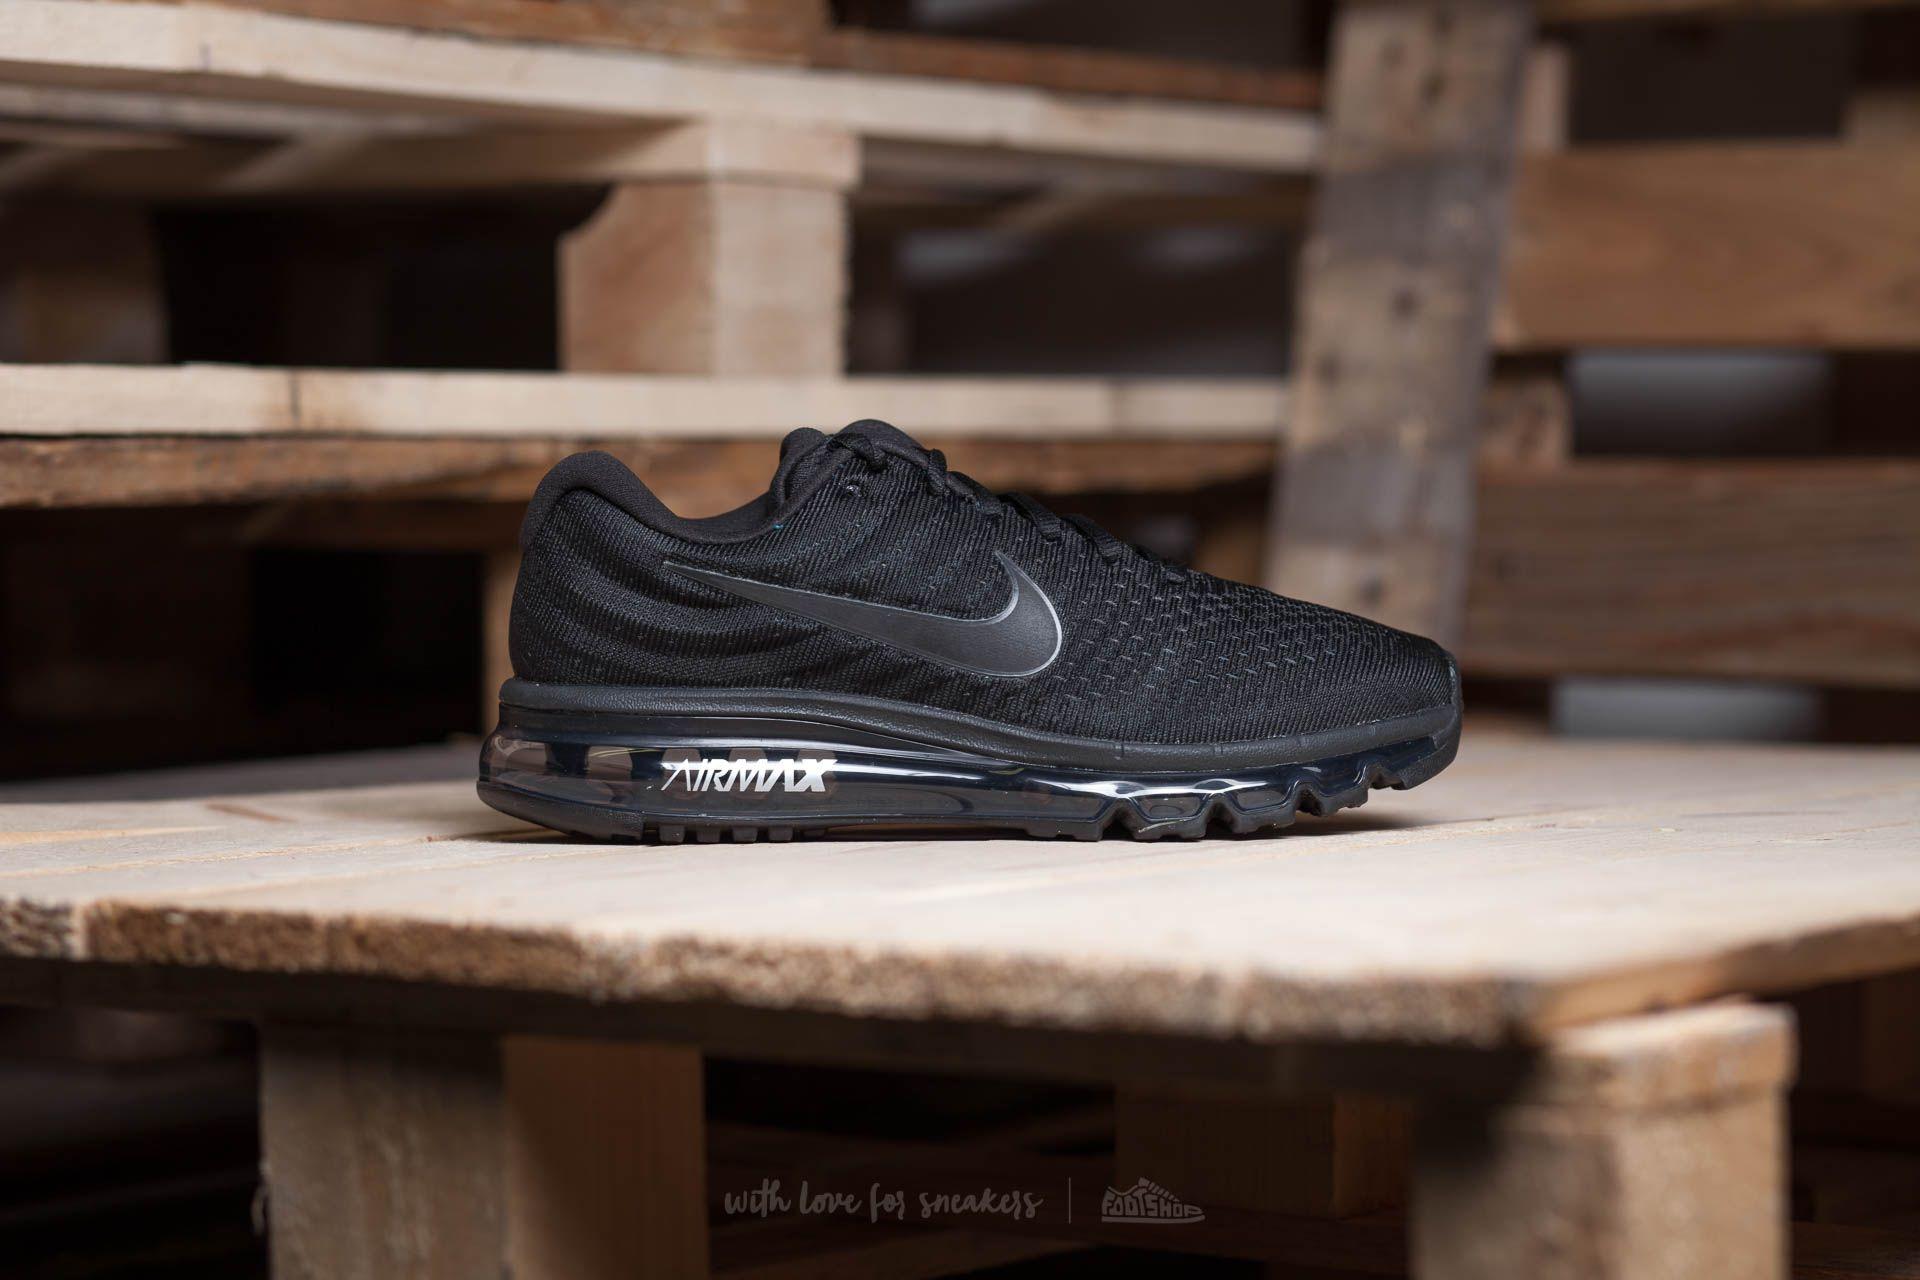 4abdc3d5e8 Nike Air Max 2017 Black/ Black-Black at a great price 136 € buy